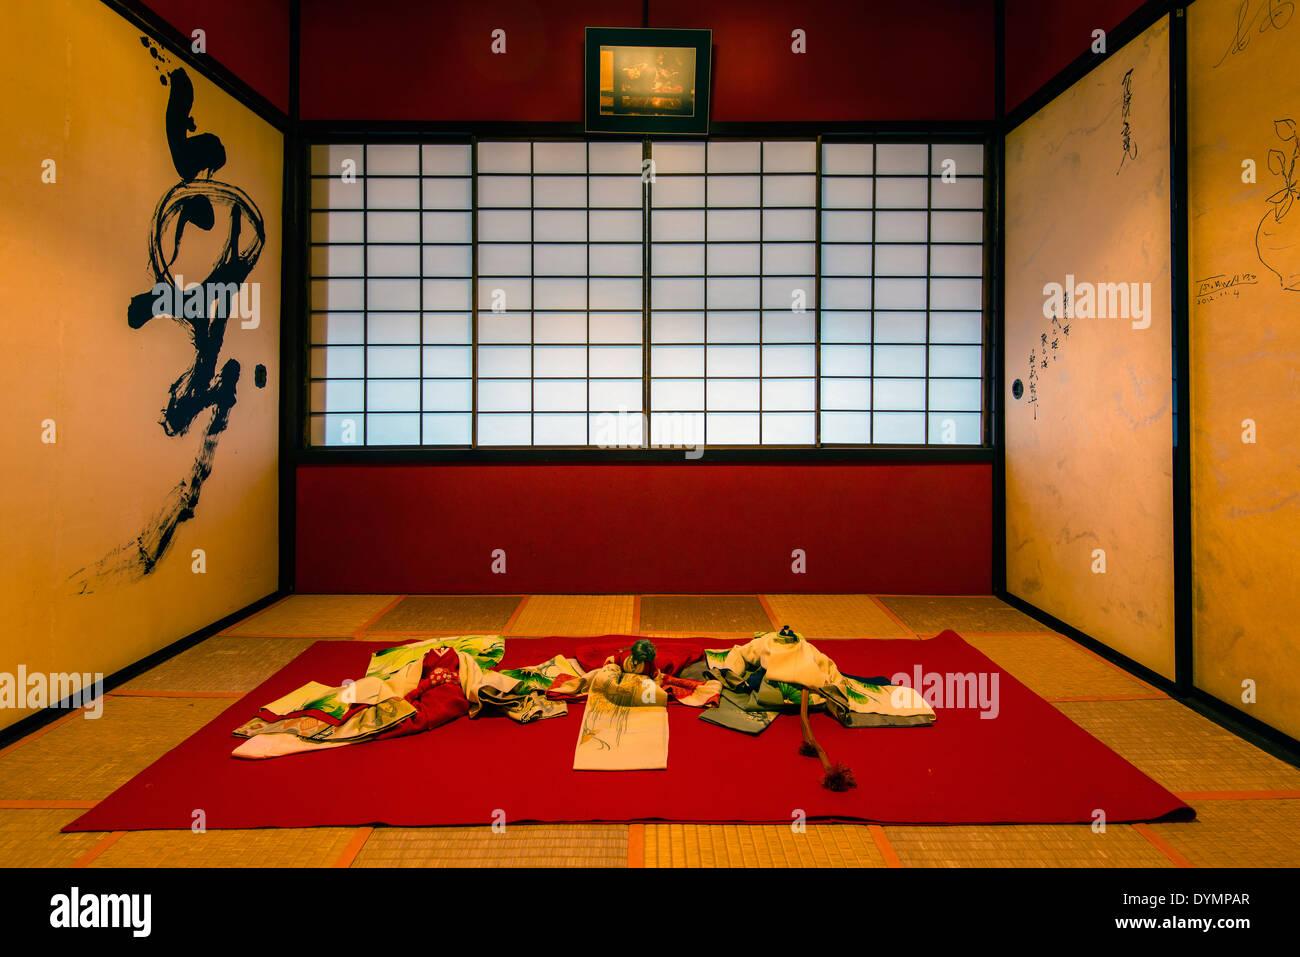 Kaikaro geisha house dated early 19th century located in the Higashi Chayagai district, Kanazawa, Ishikawa Prefecture, Japan - Stock Image